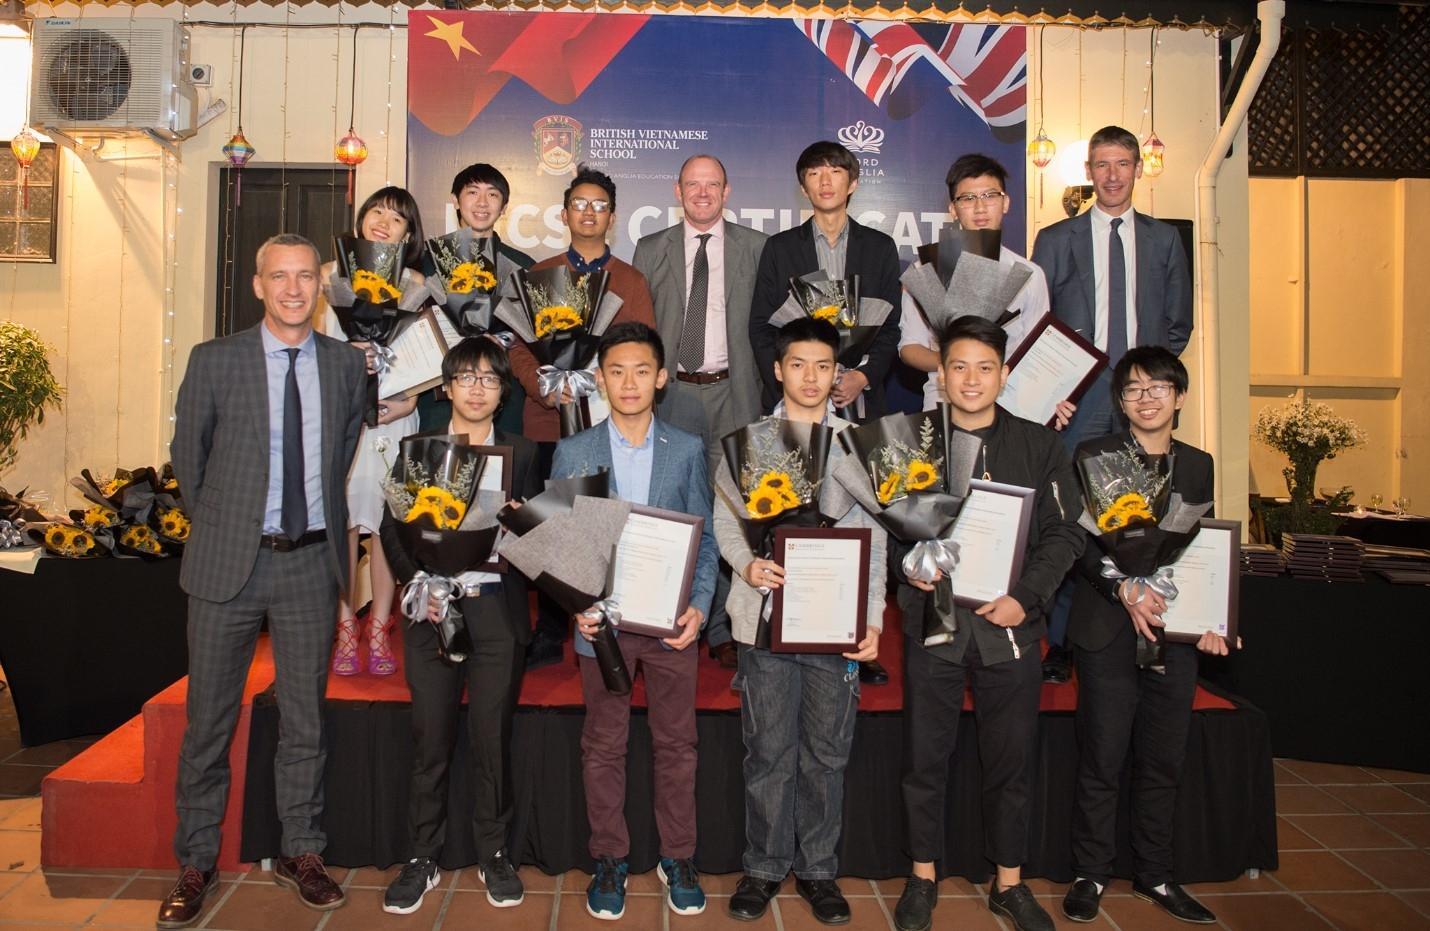 stellar examination results for student at the british vietnamese international school in igcse